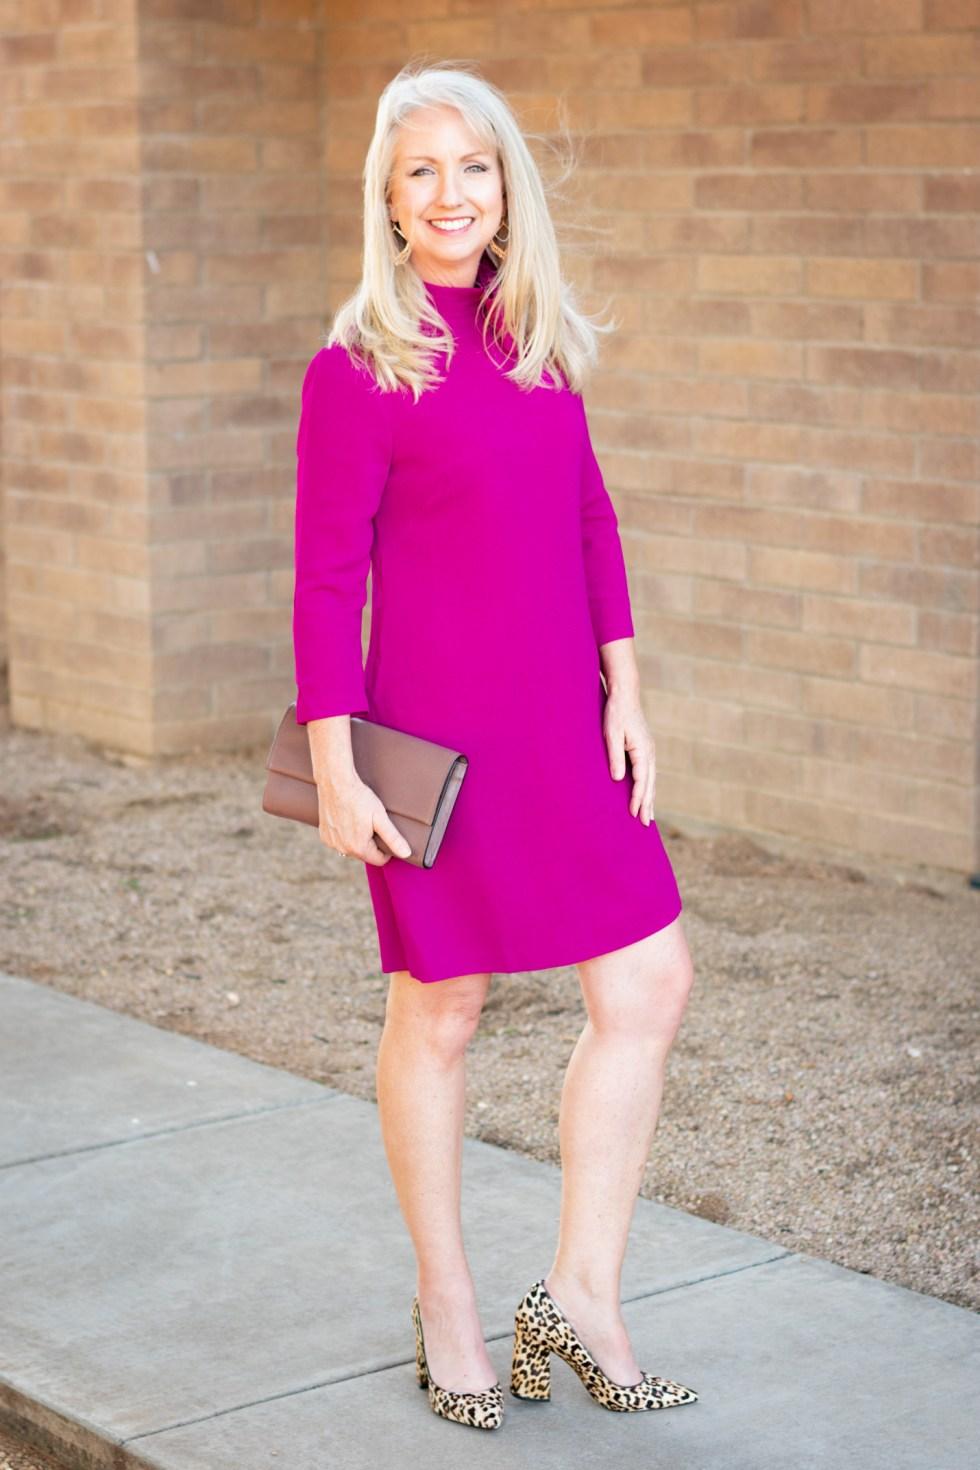 https://www.glamourmagazine.co.uk/gallery/how-to-wear-leopard-print